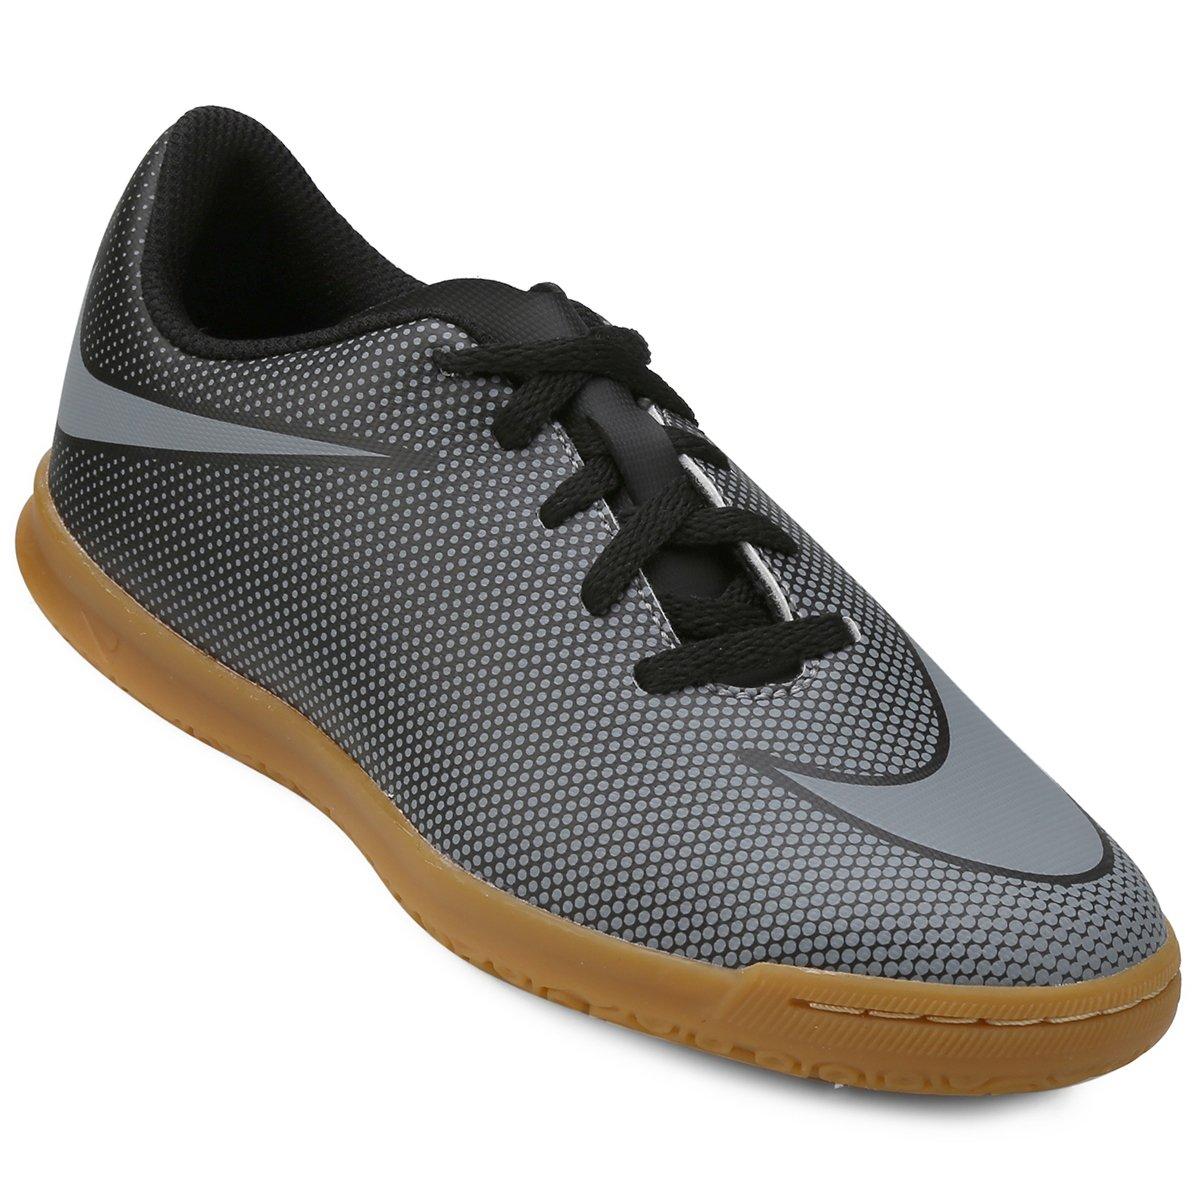 b4acf48de9 Chuteira Futsal Infantil Nike Bravata 2 IC - Compre Agora